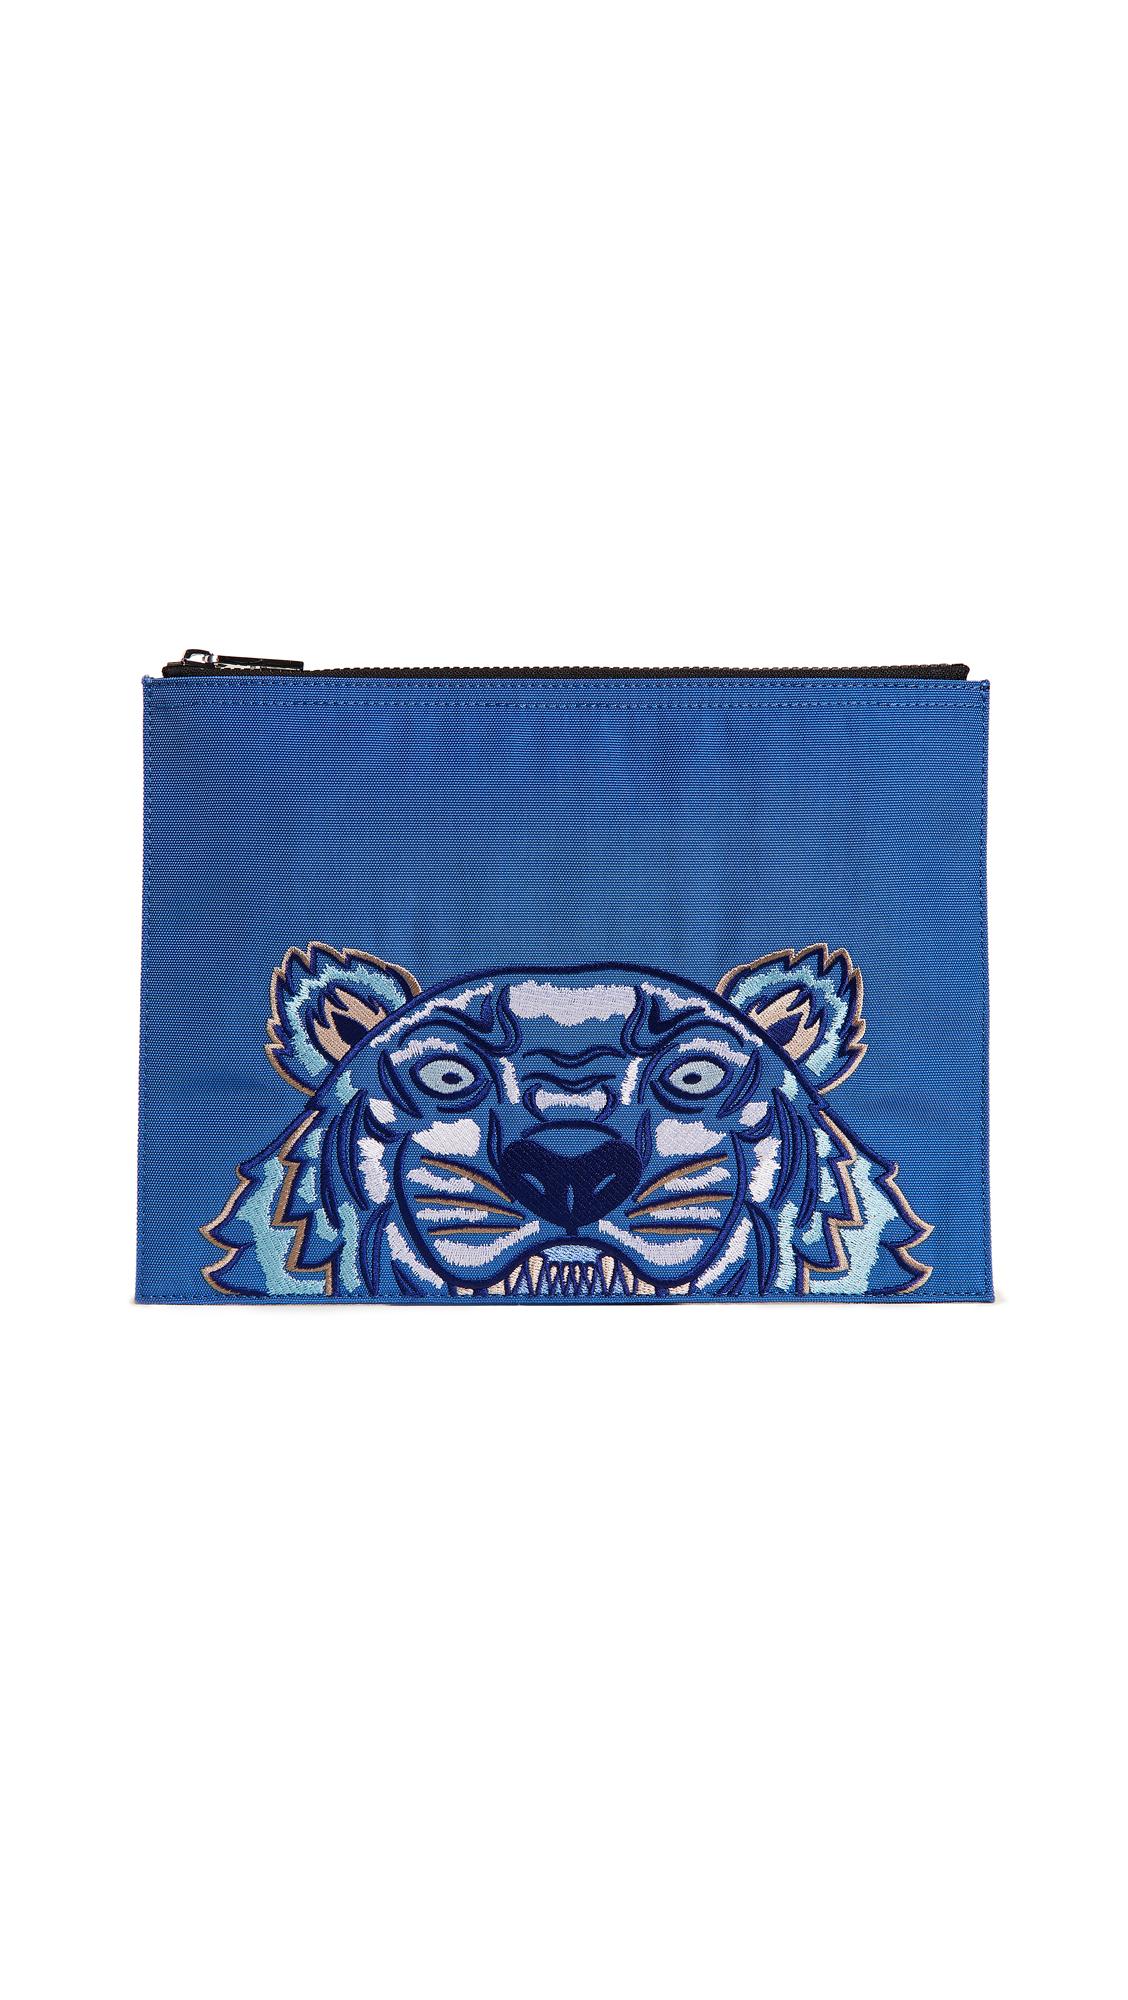 TIGER BLUE CAPSULE POUCH